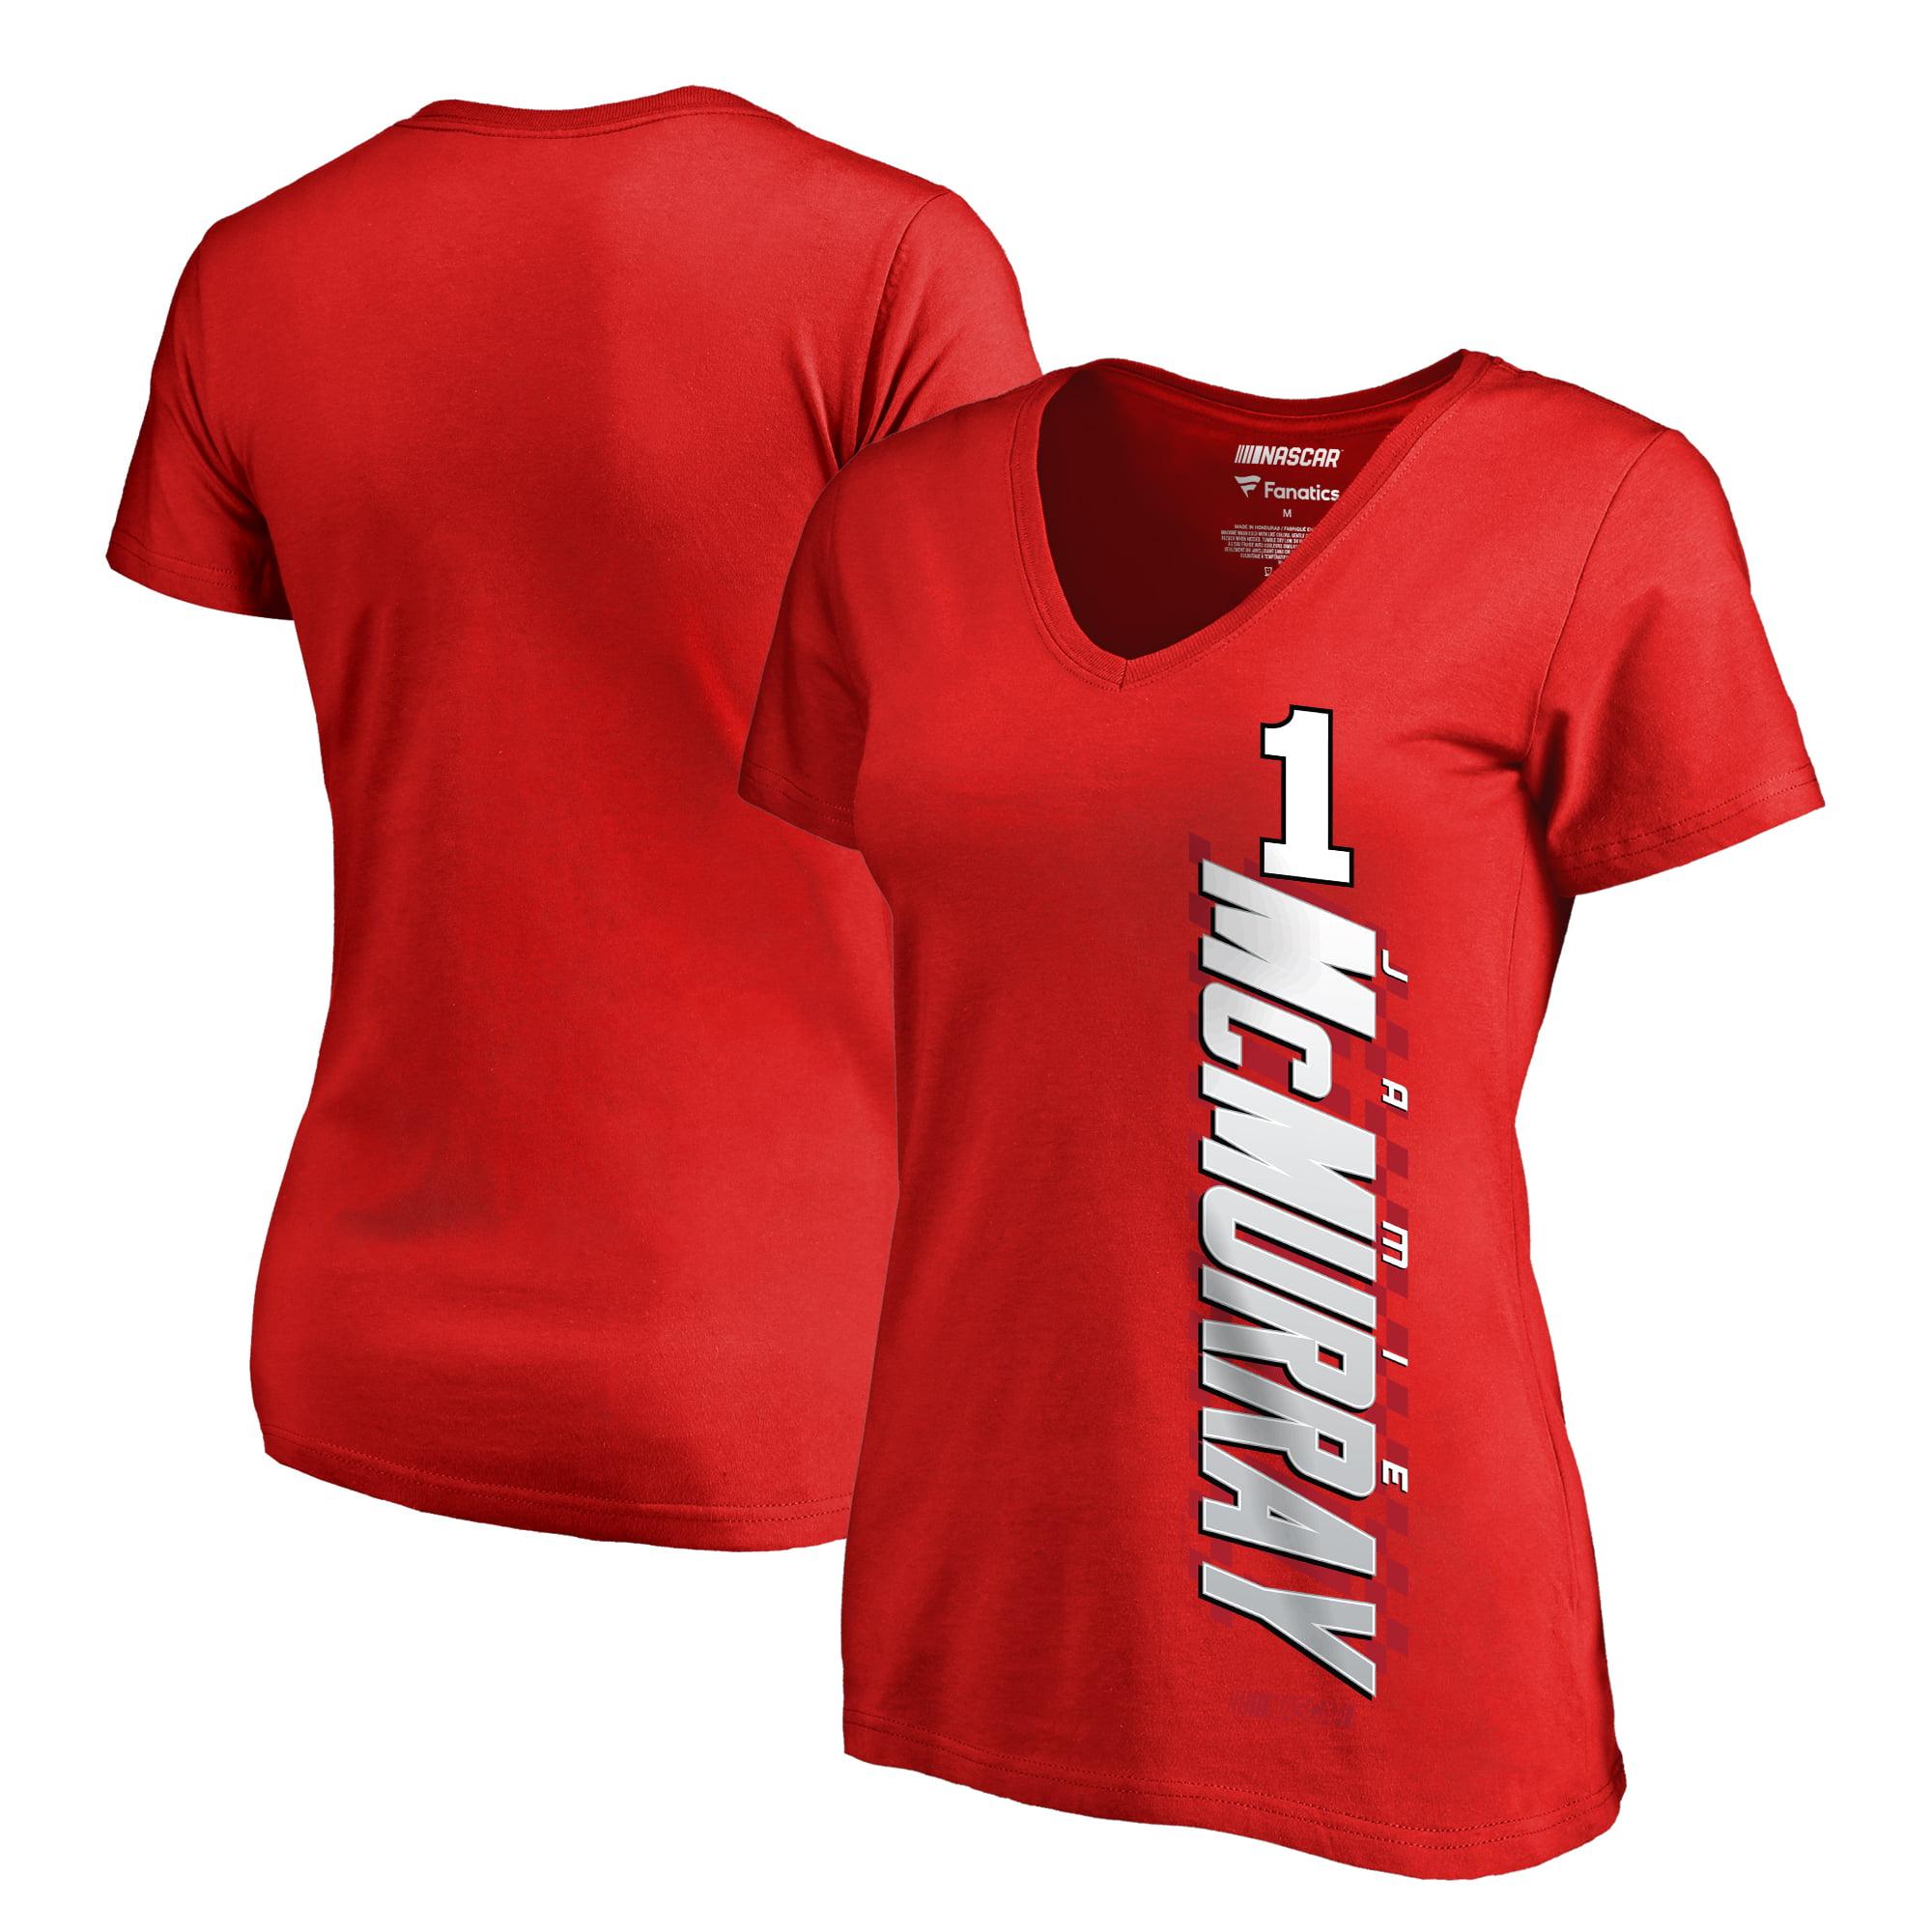 Jamie McMurray Fanatics Branded Women's Alternator T-Shirt - Red